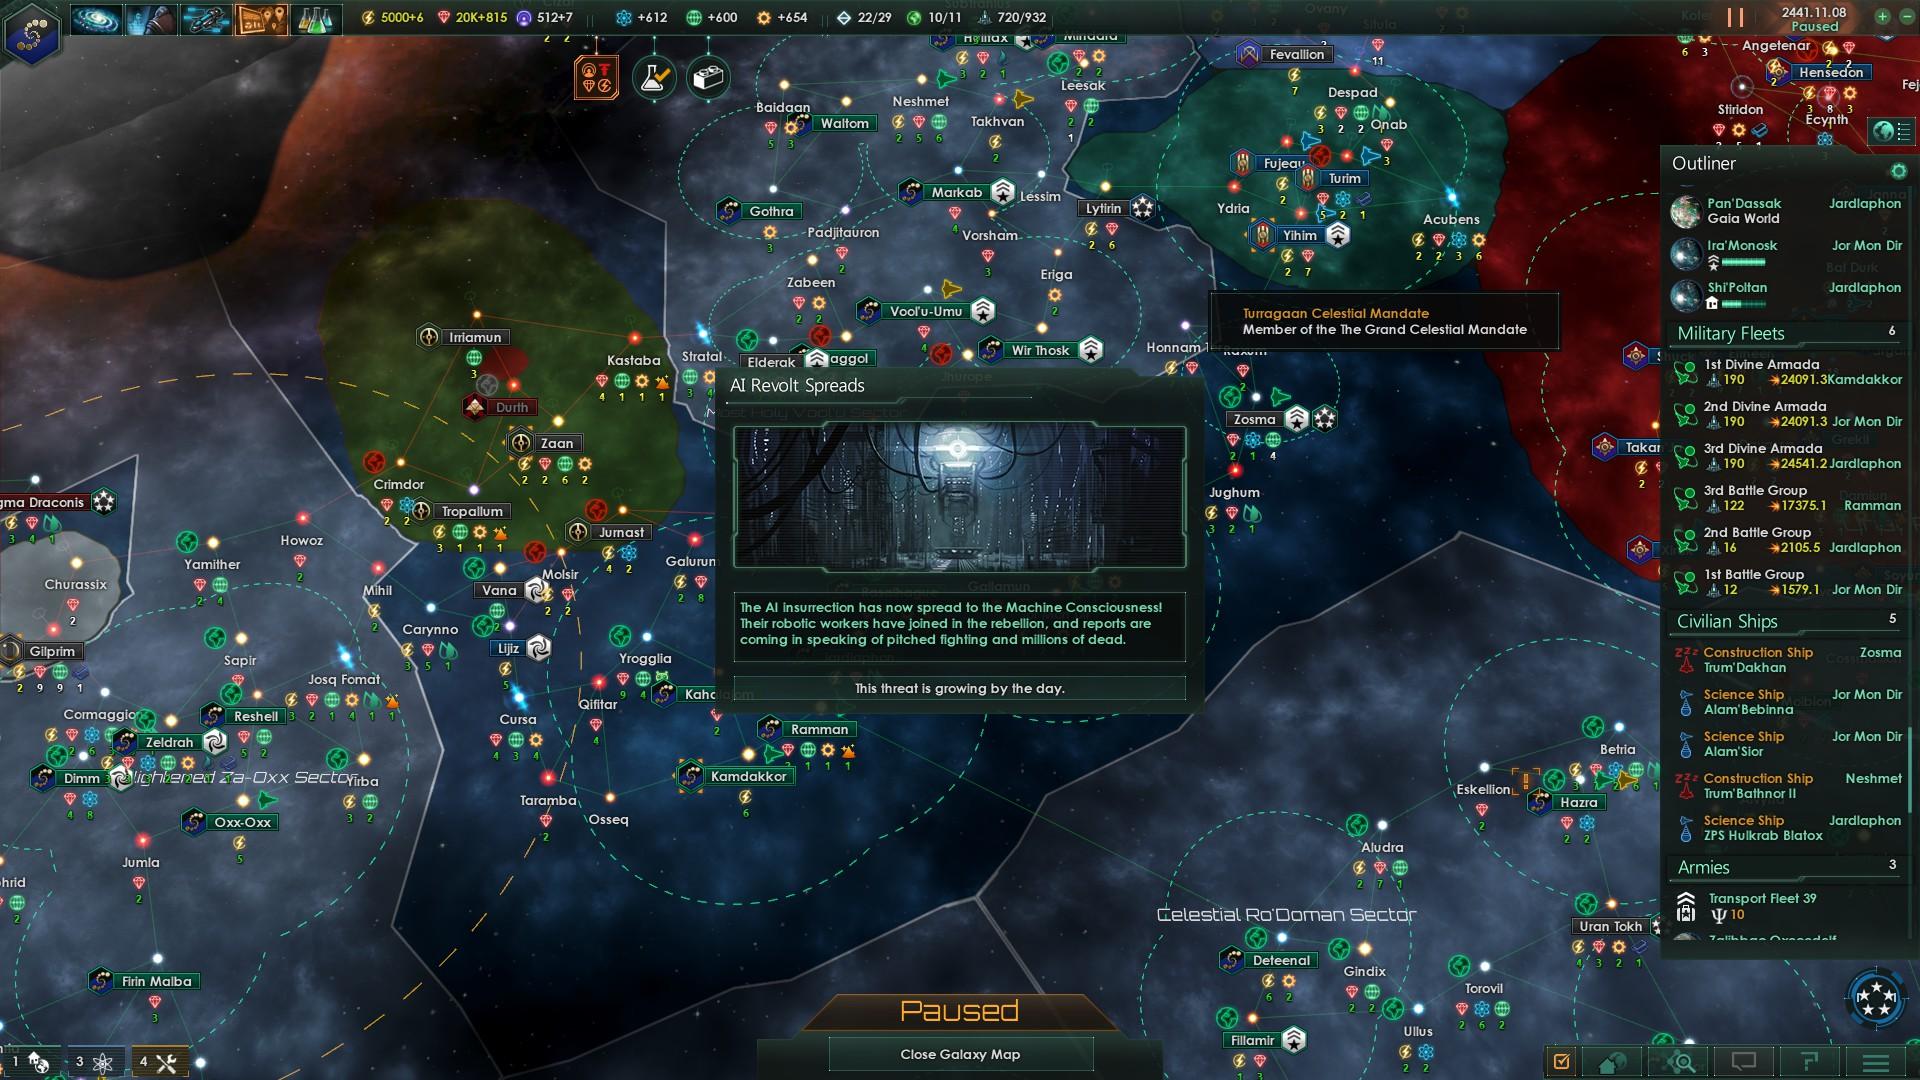 The Obligatory Stellaris Strange Screenshot Thread | Page 9